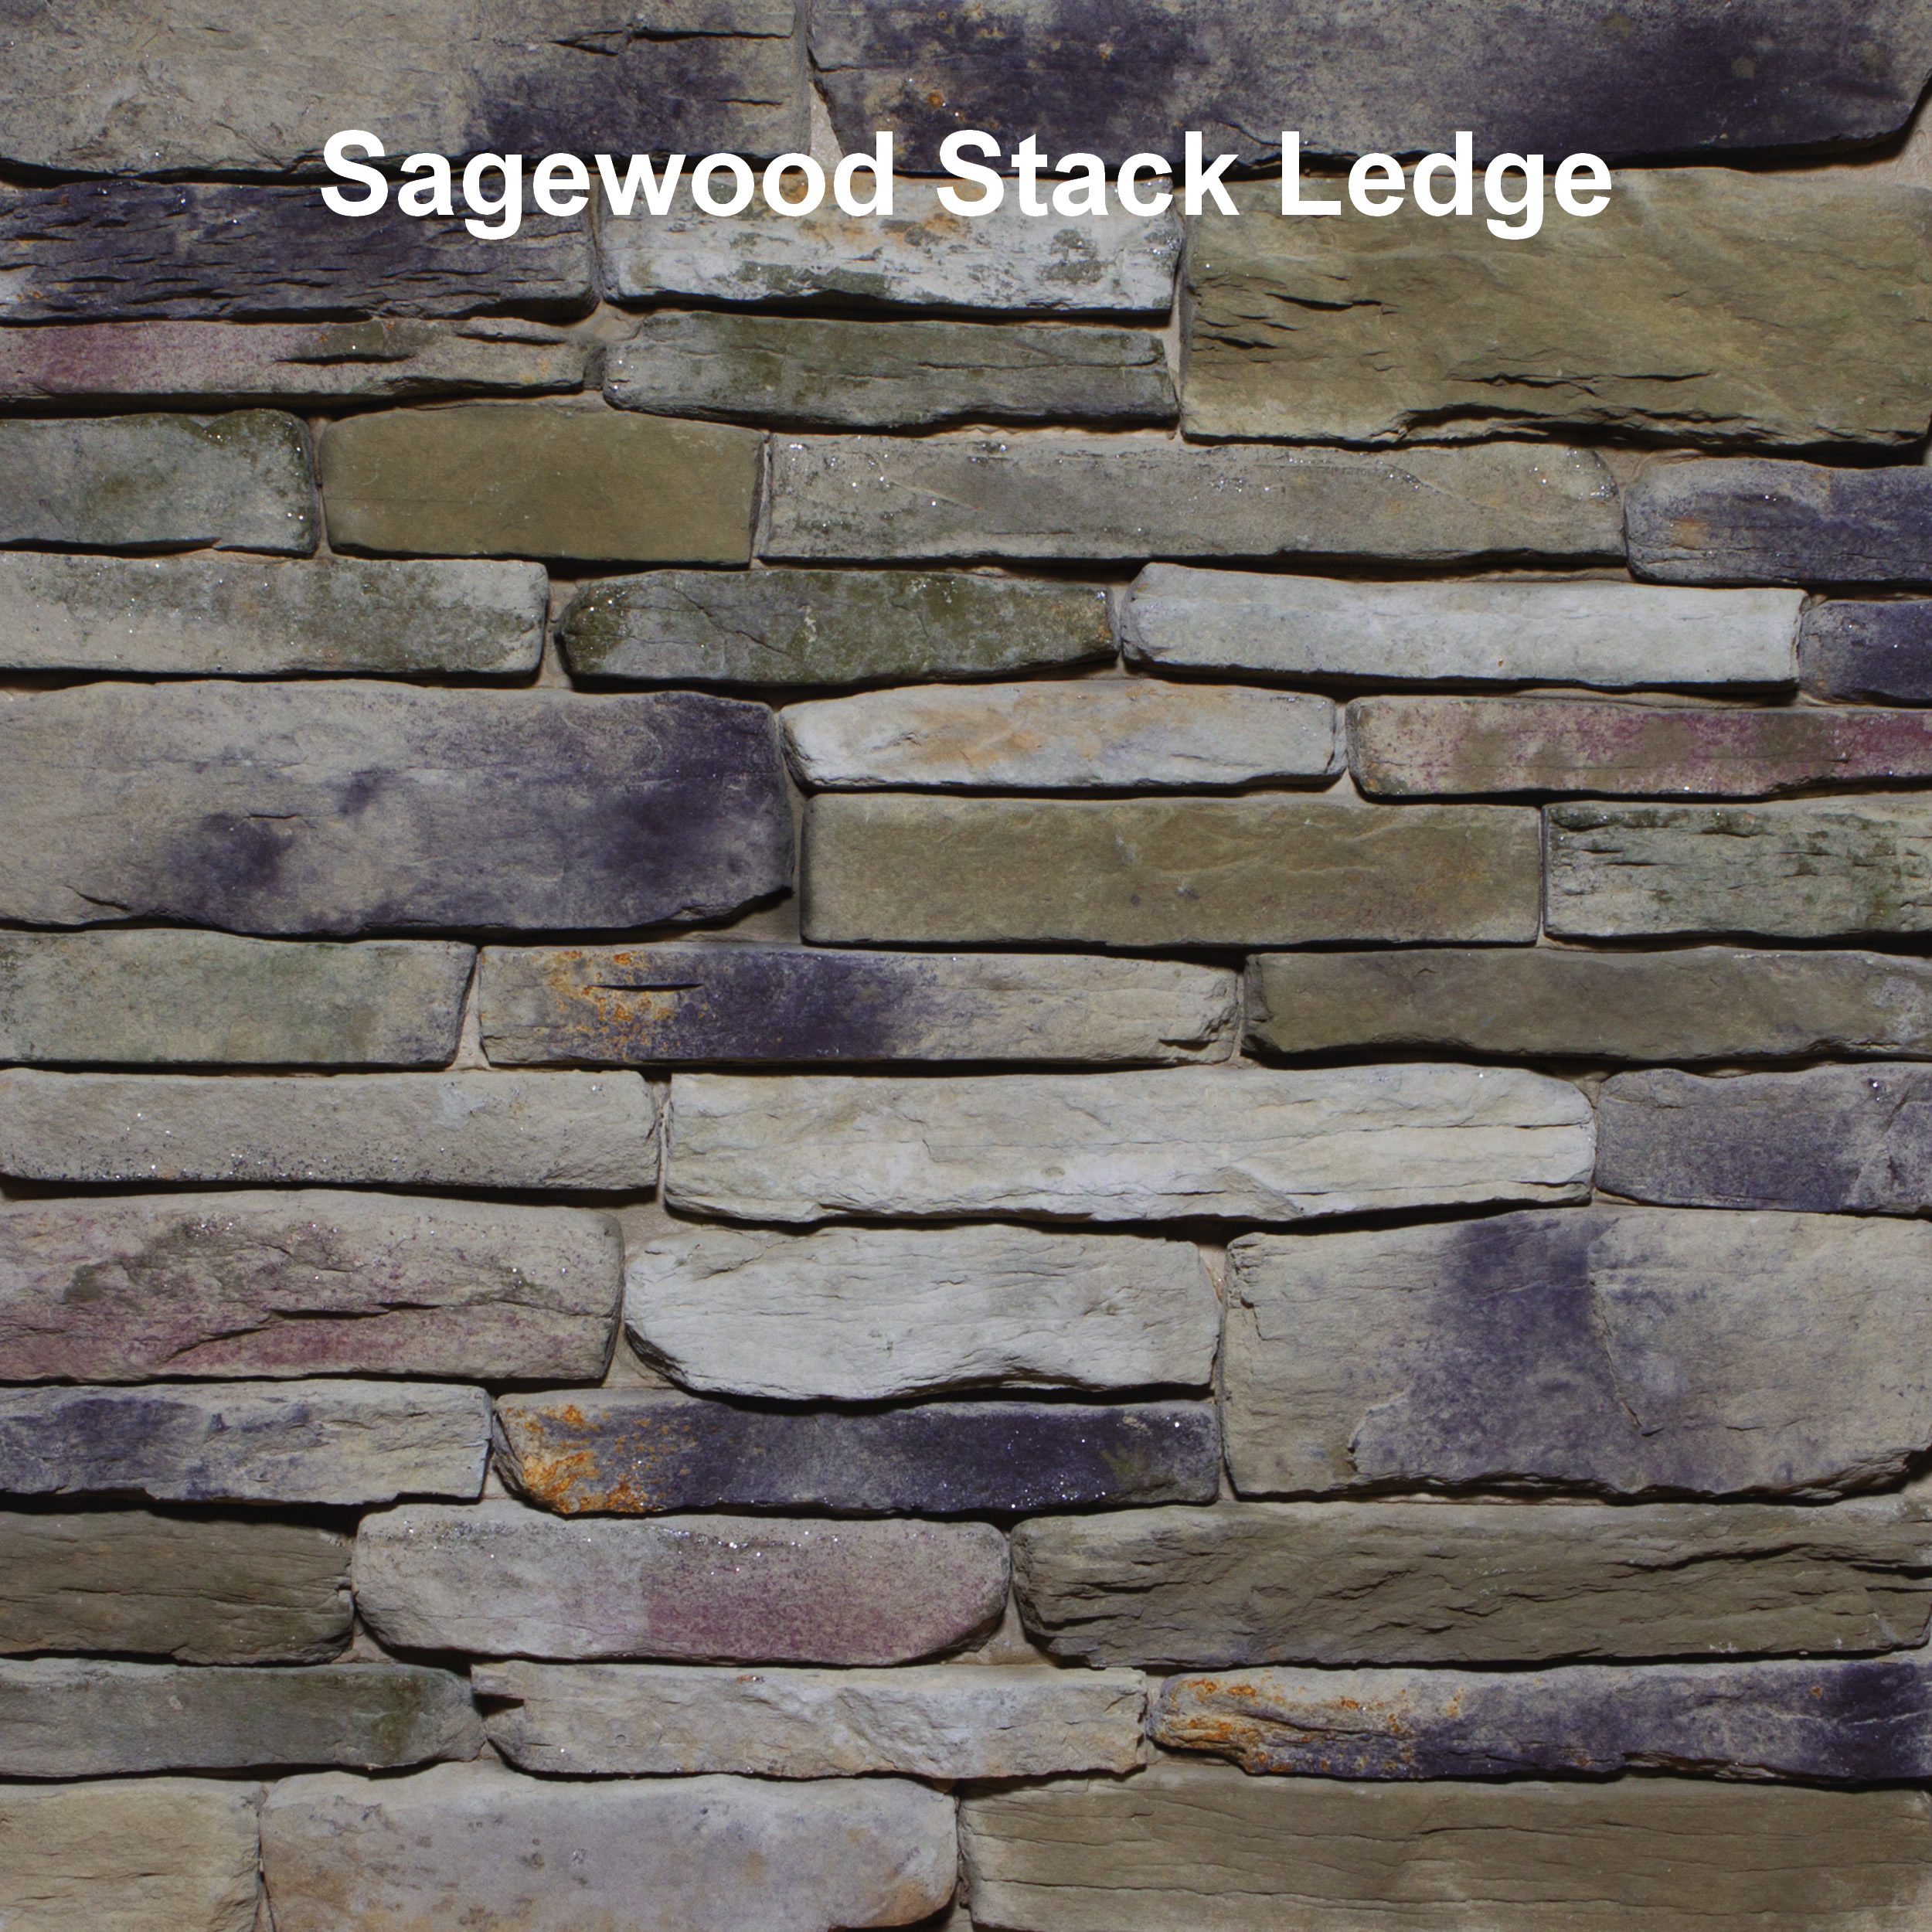 DQ_Stack Ledge_Sagewood_Profile.jpg